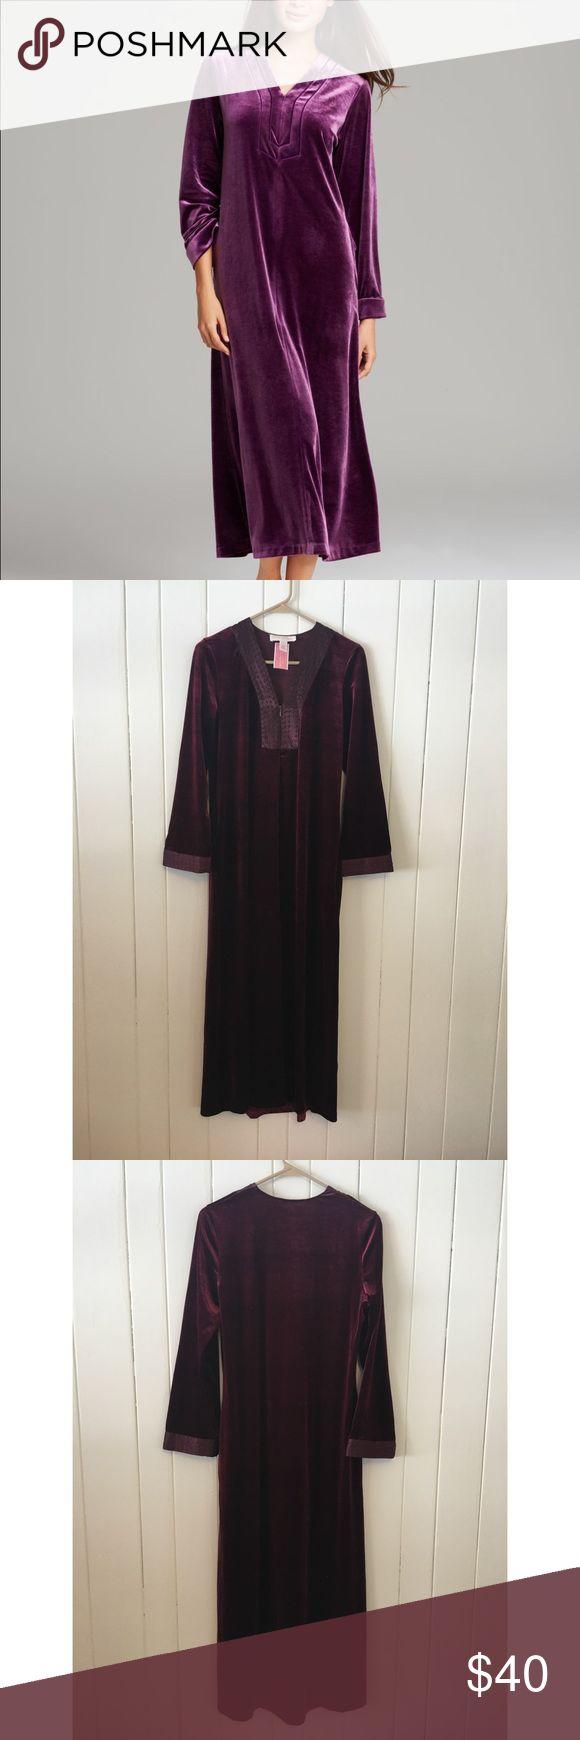 Oscar De La Renta Velvet Zahara Nights Nightgown NWT Oscar De La Renta Pink Label velvet nightgown dress. Size small. Oscar de la Renta Dresses Maxi